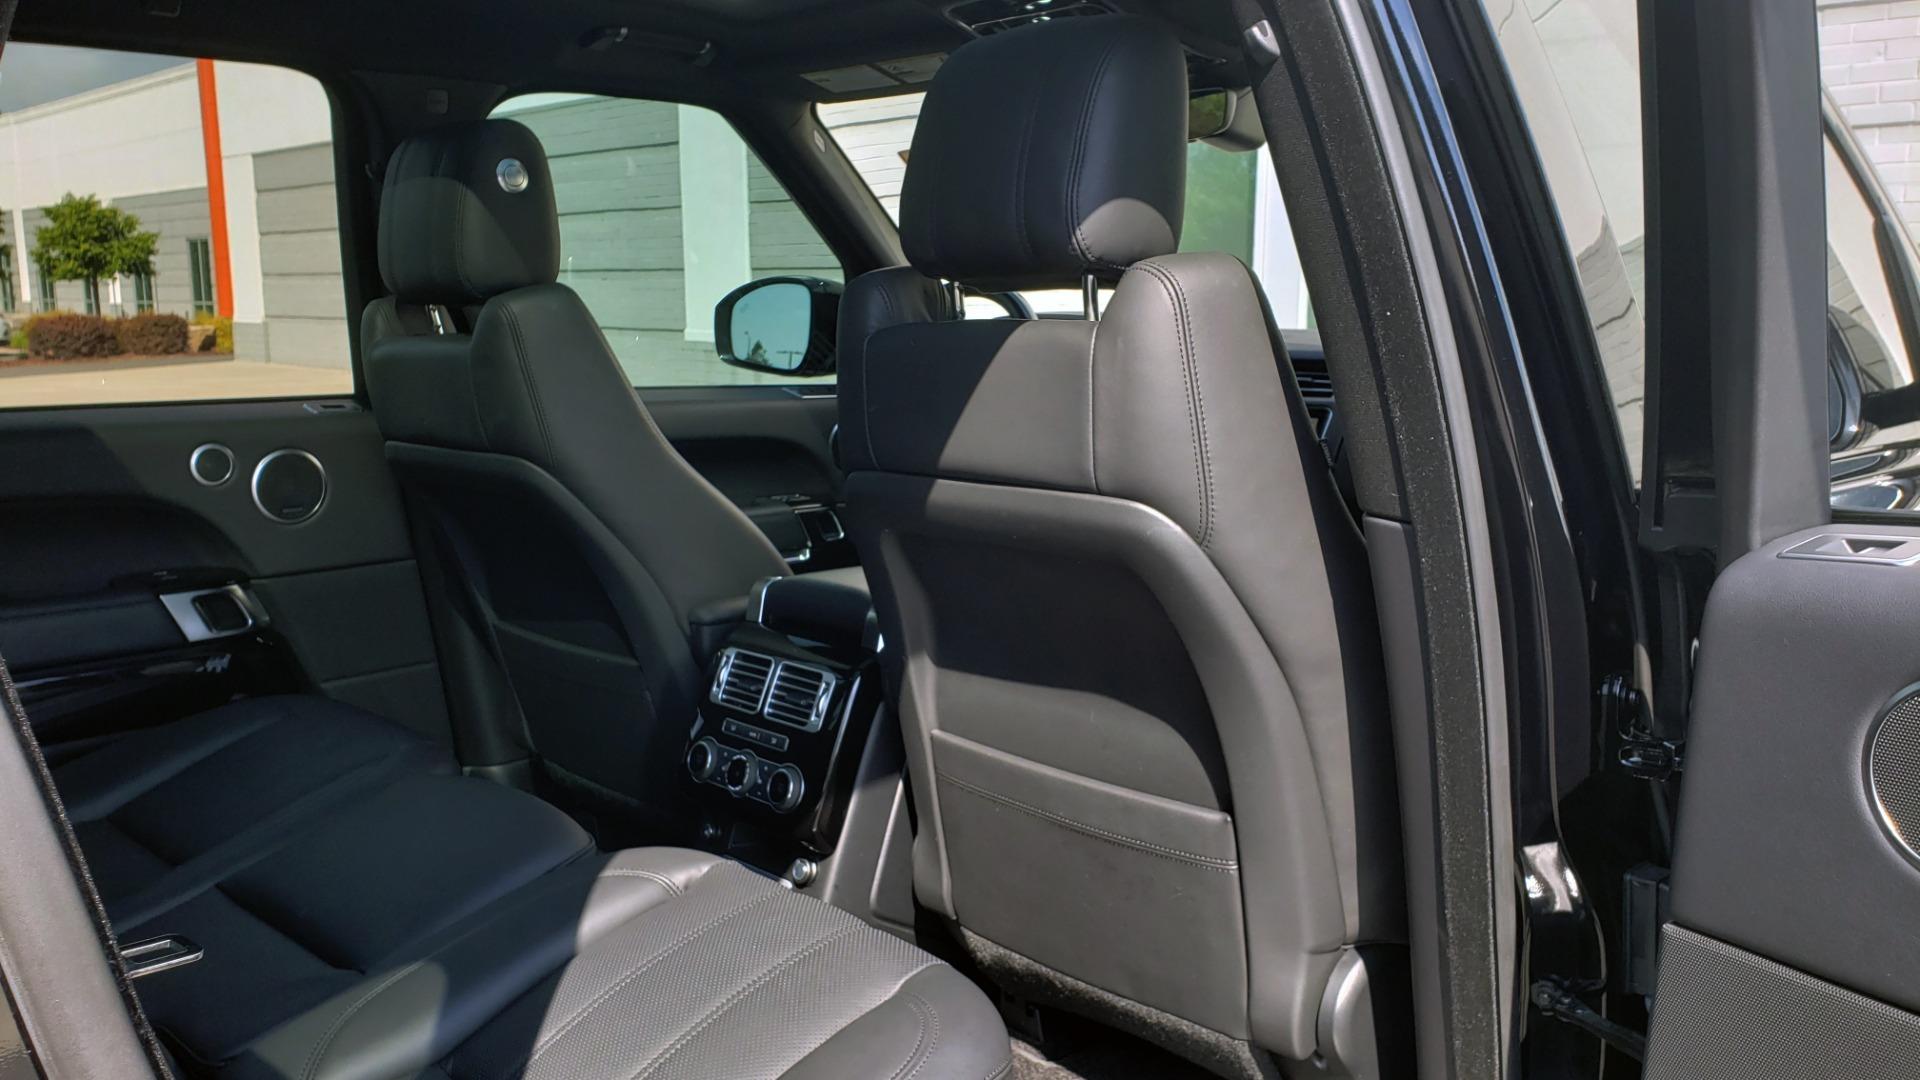 Used 2017 Land Rover RANGE ROVER SC V8 / VISION ASST / DRIVE PKG / MERIDIAN SOUND / PANO-ROOF / NAV / BSM for sale $75,995 at Formula Imports in Charlotte NC 28227 82